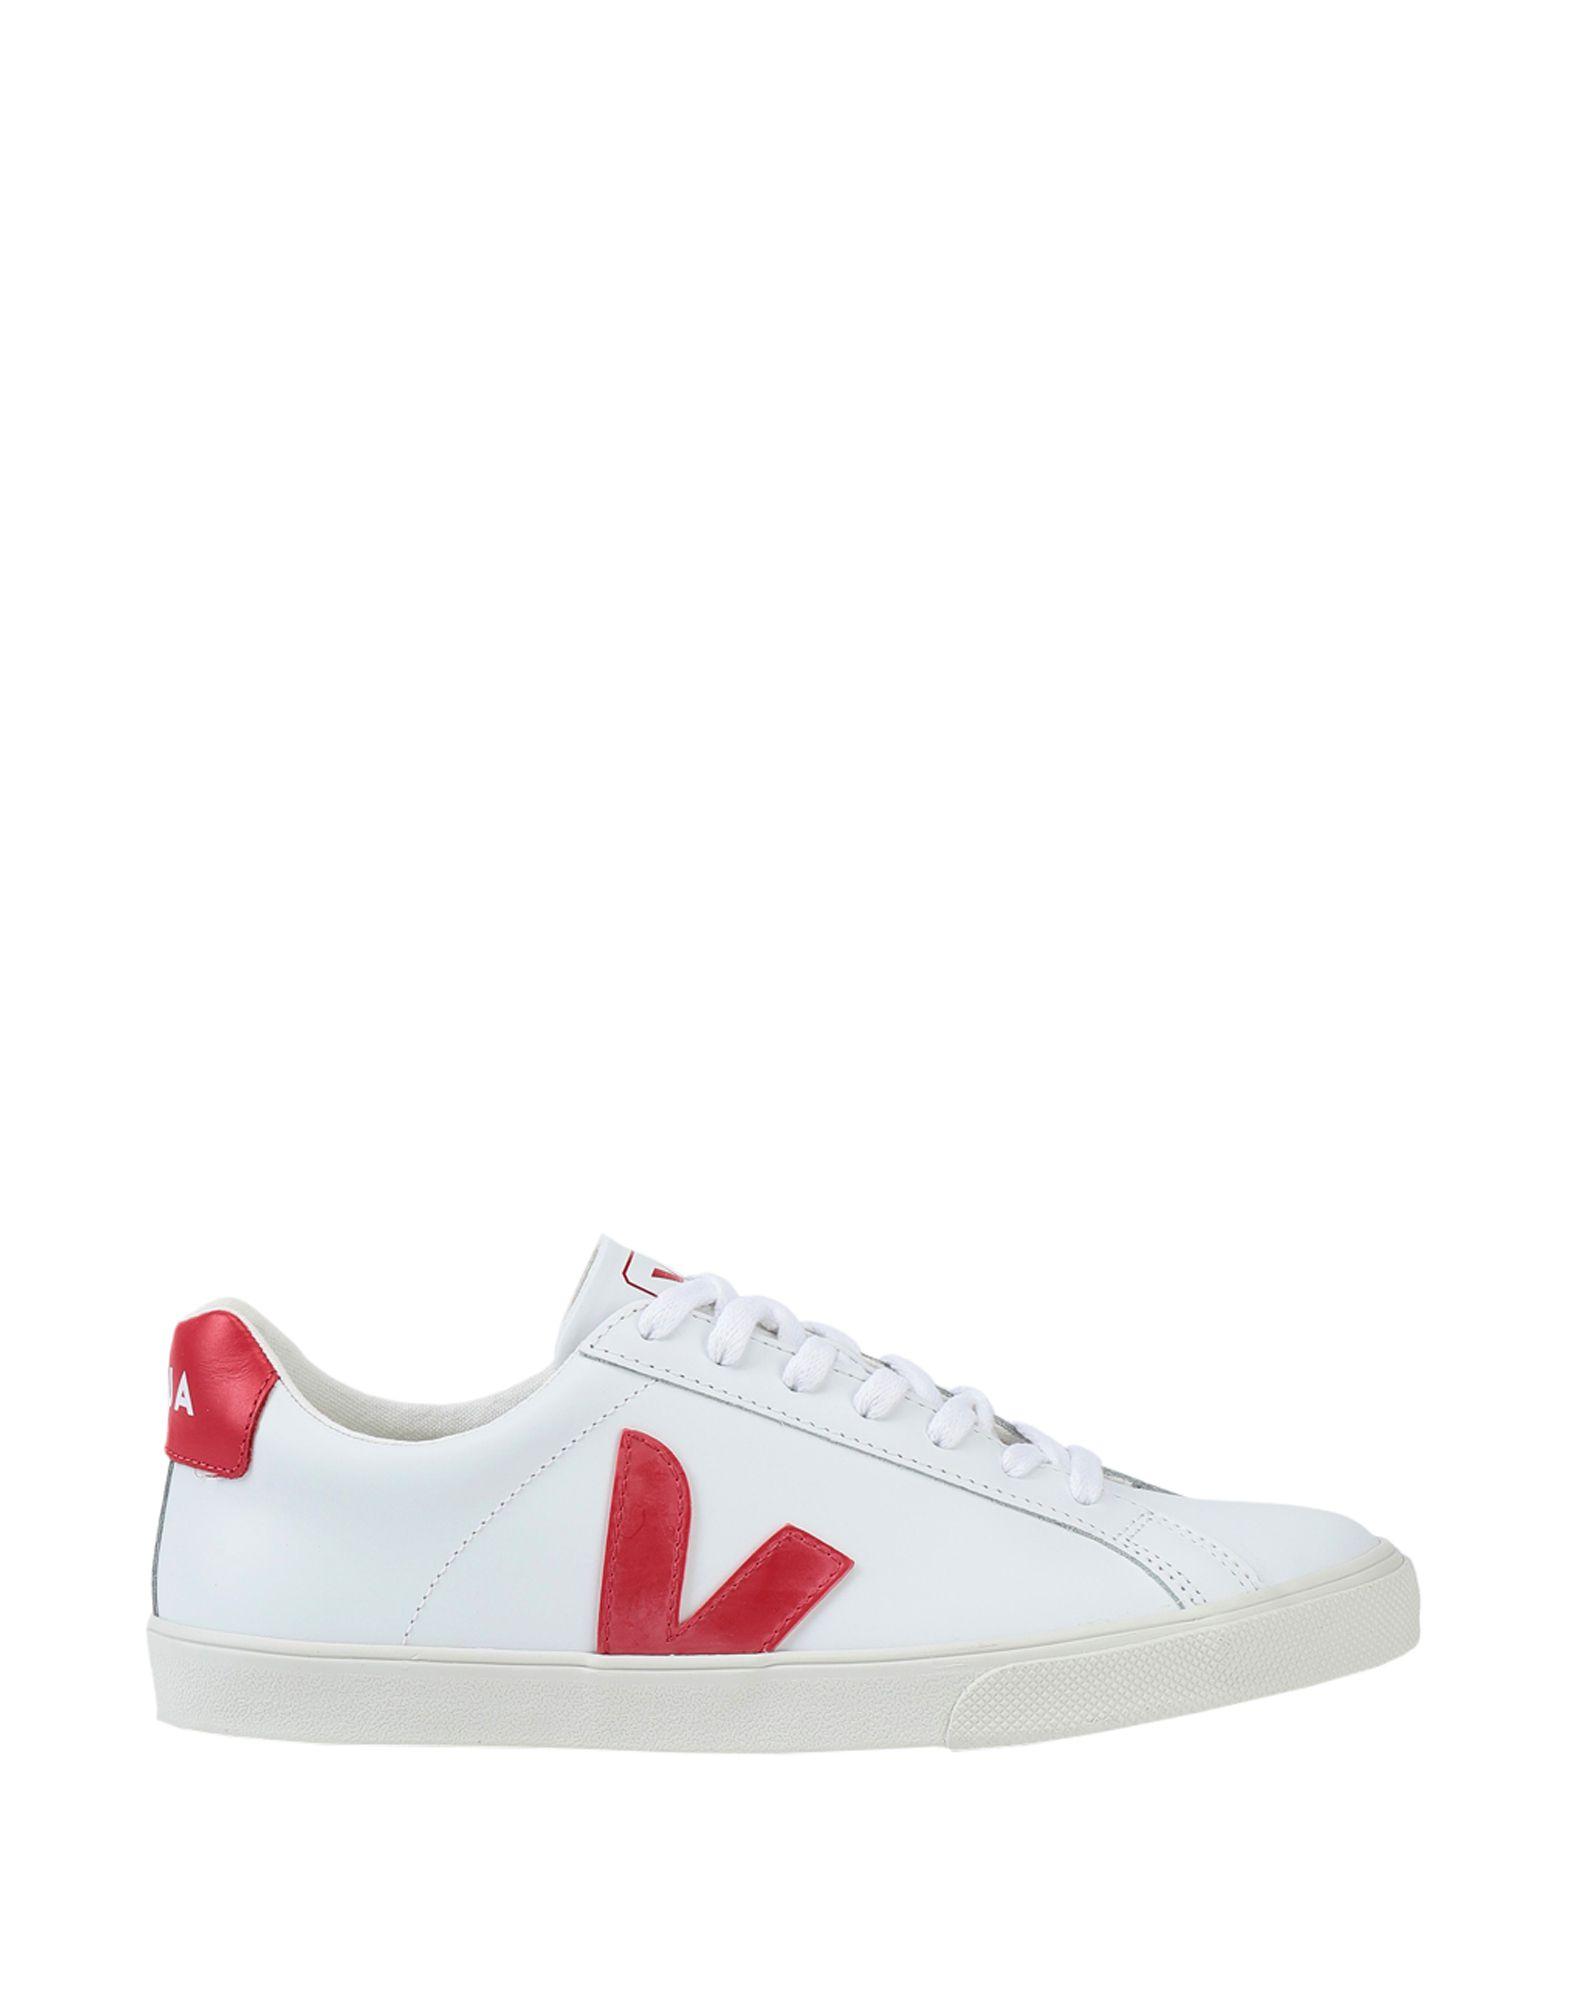 Veja Sneakers - Women Veja Sneakers online on 11568635WS  United Kingdom - 11568635WS on f7aac5